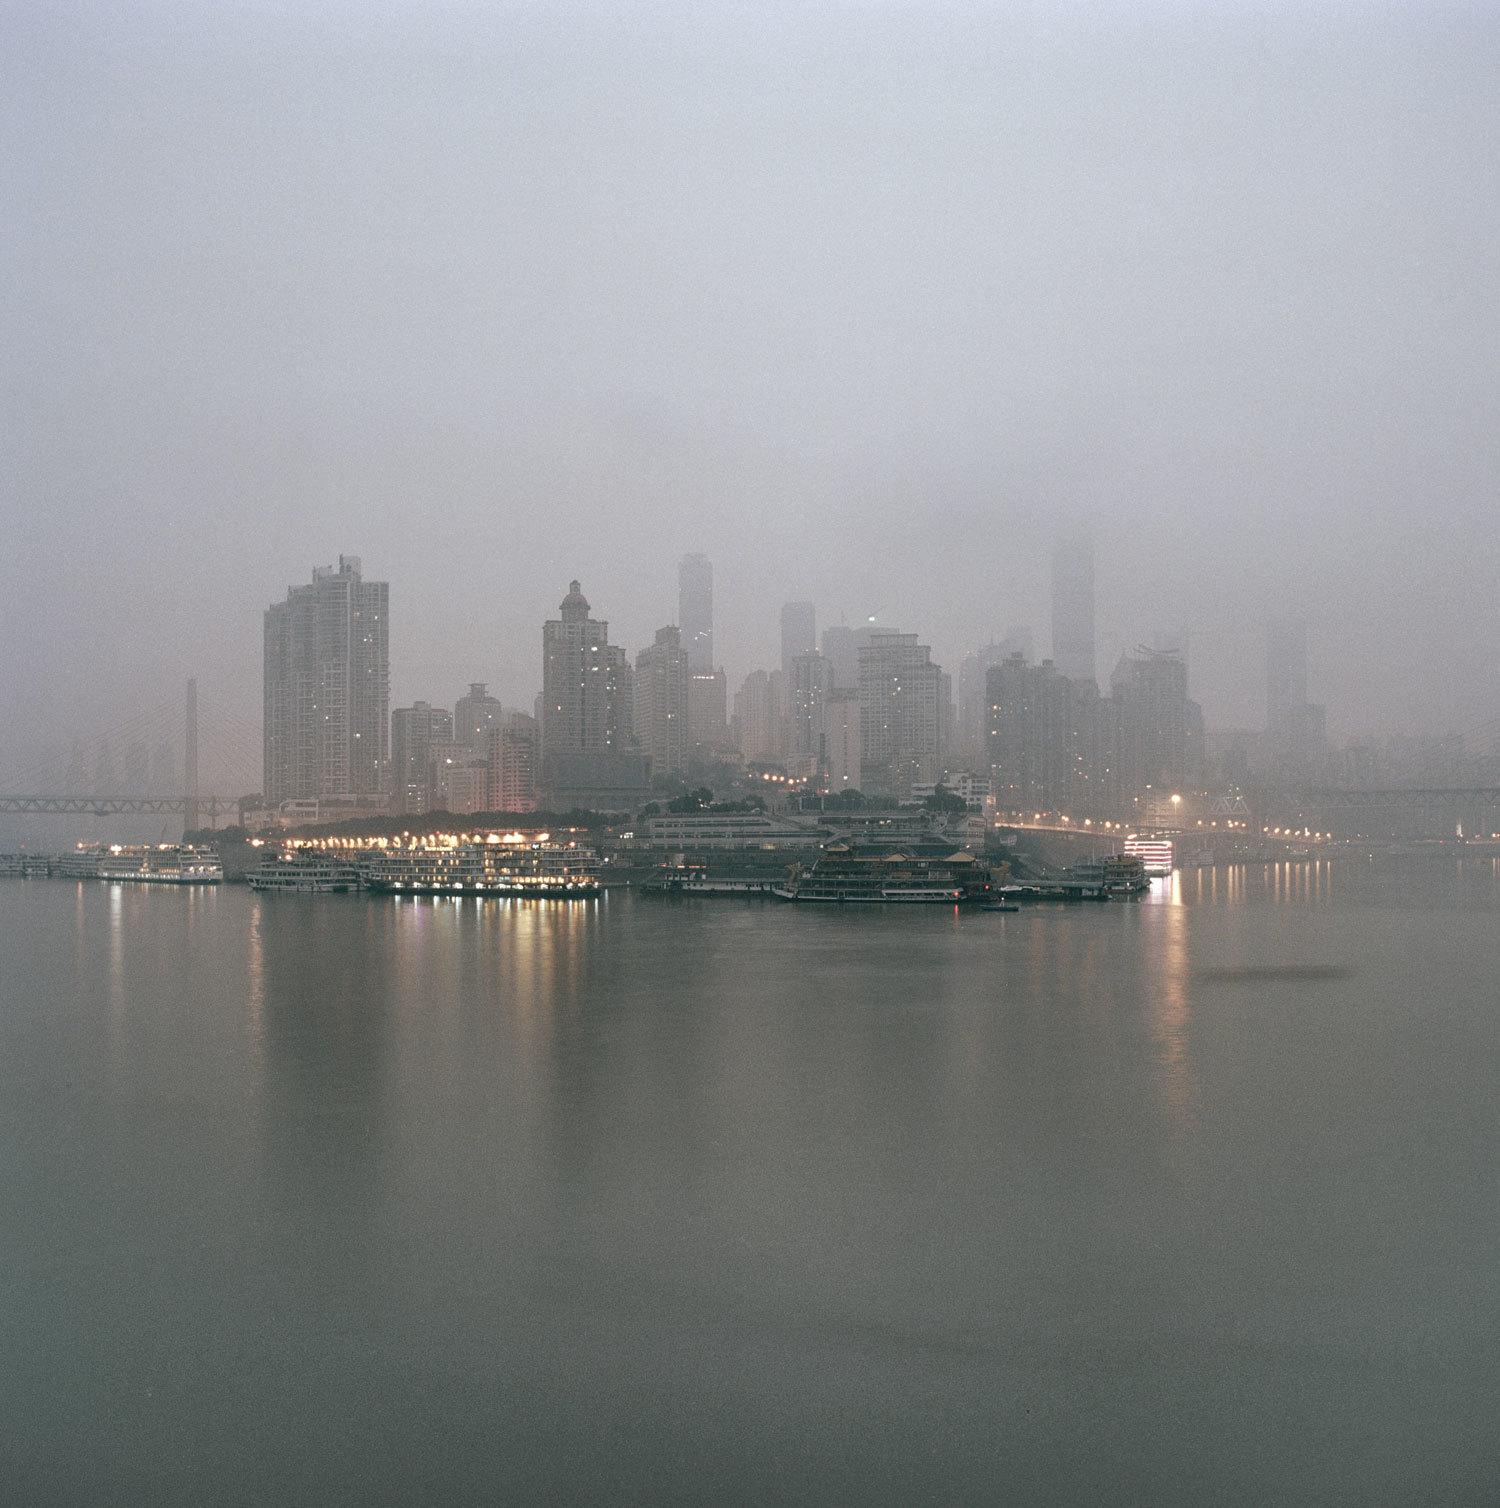 Chongqing Chaotianmen at dusk